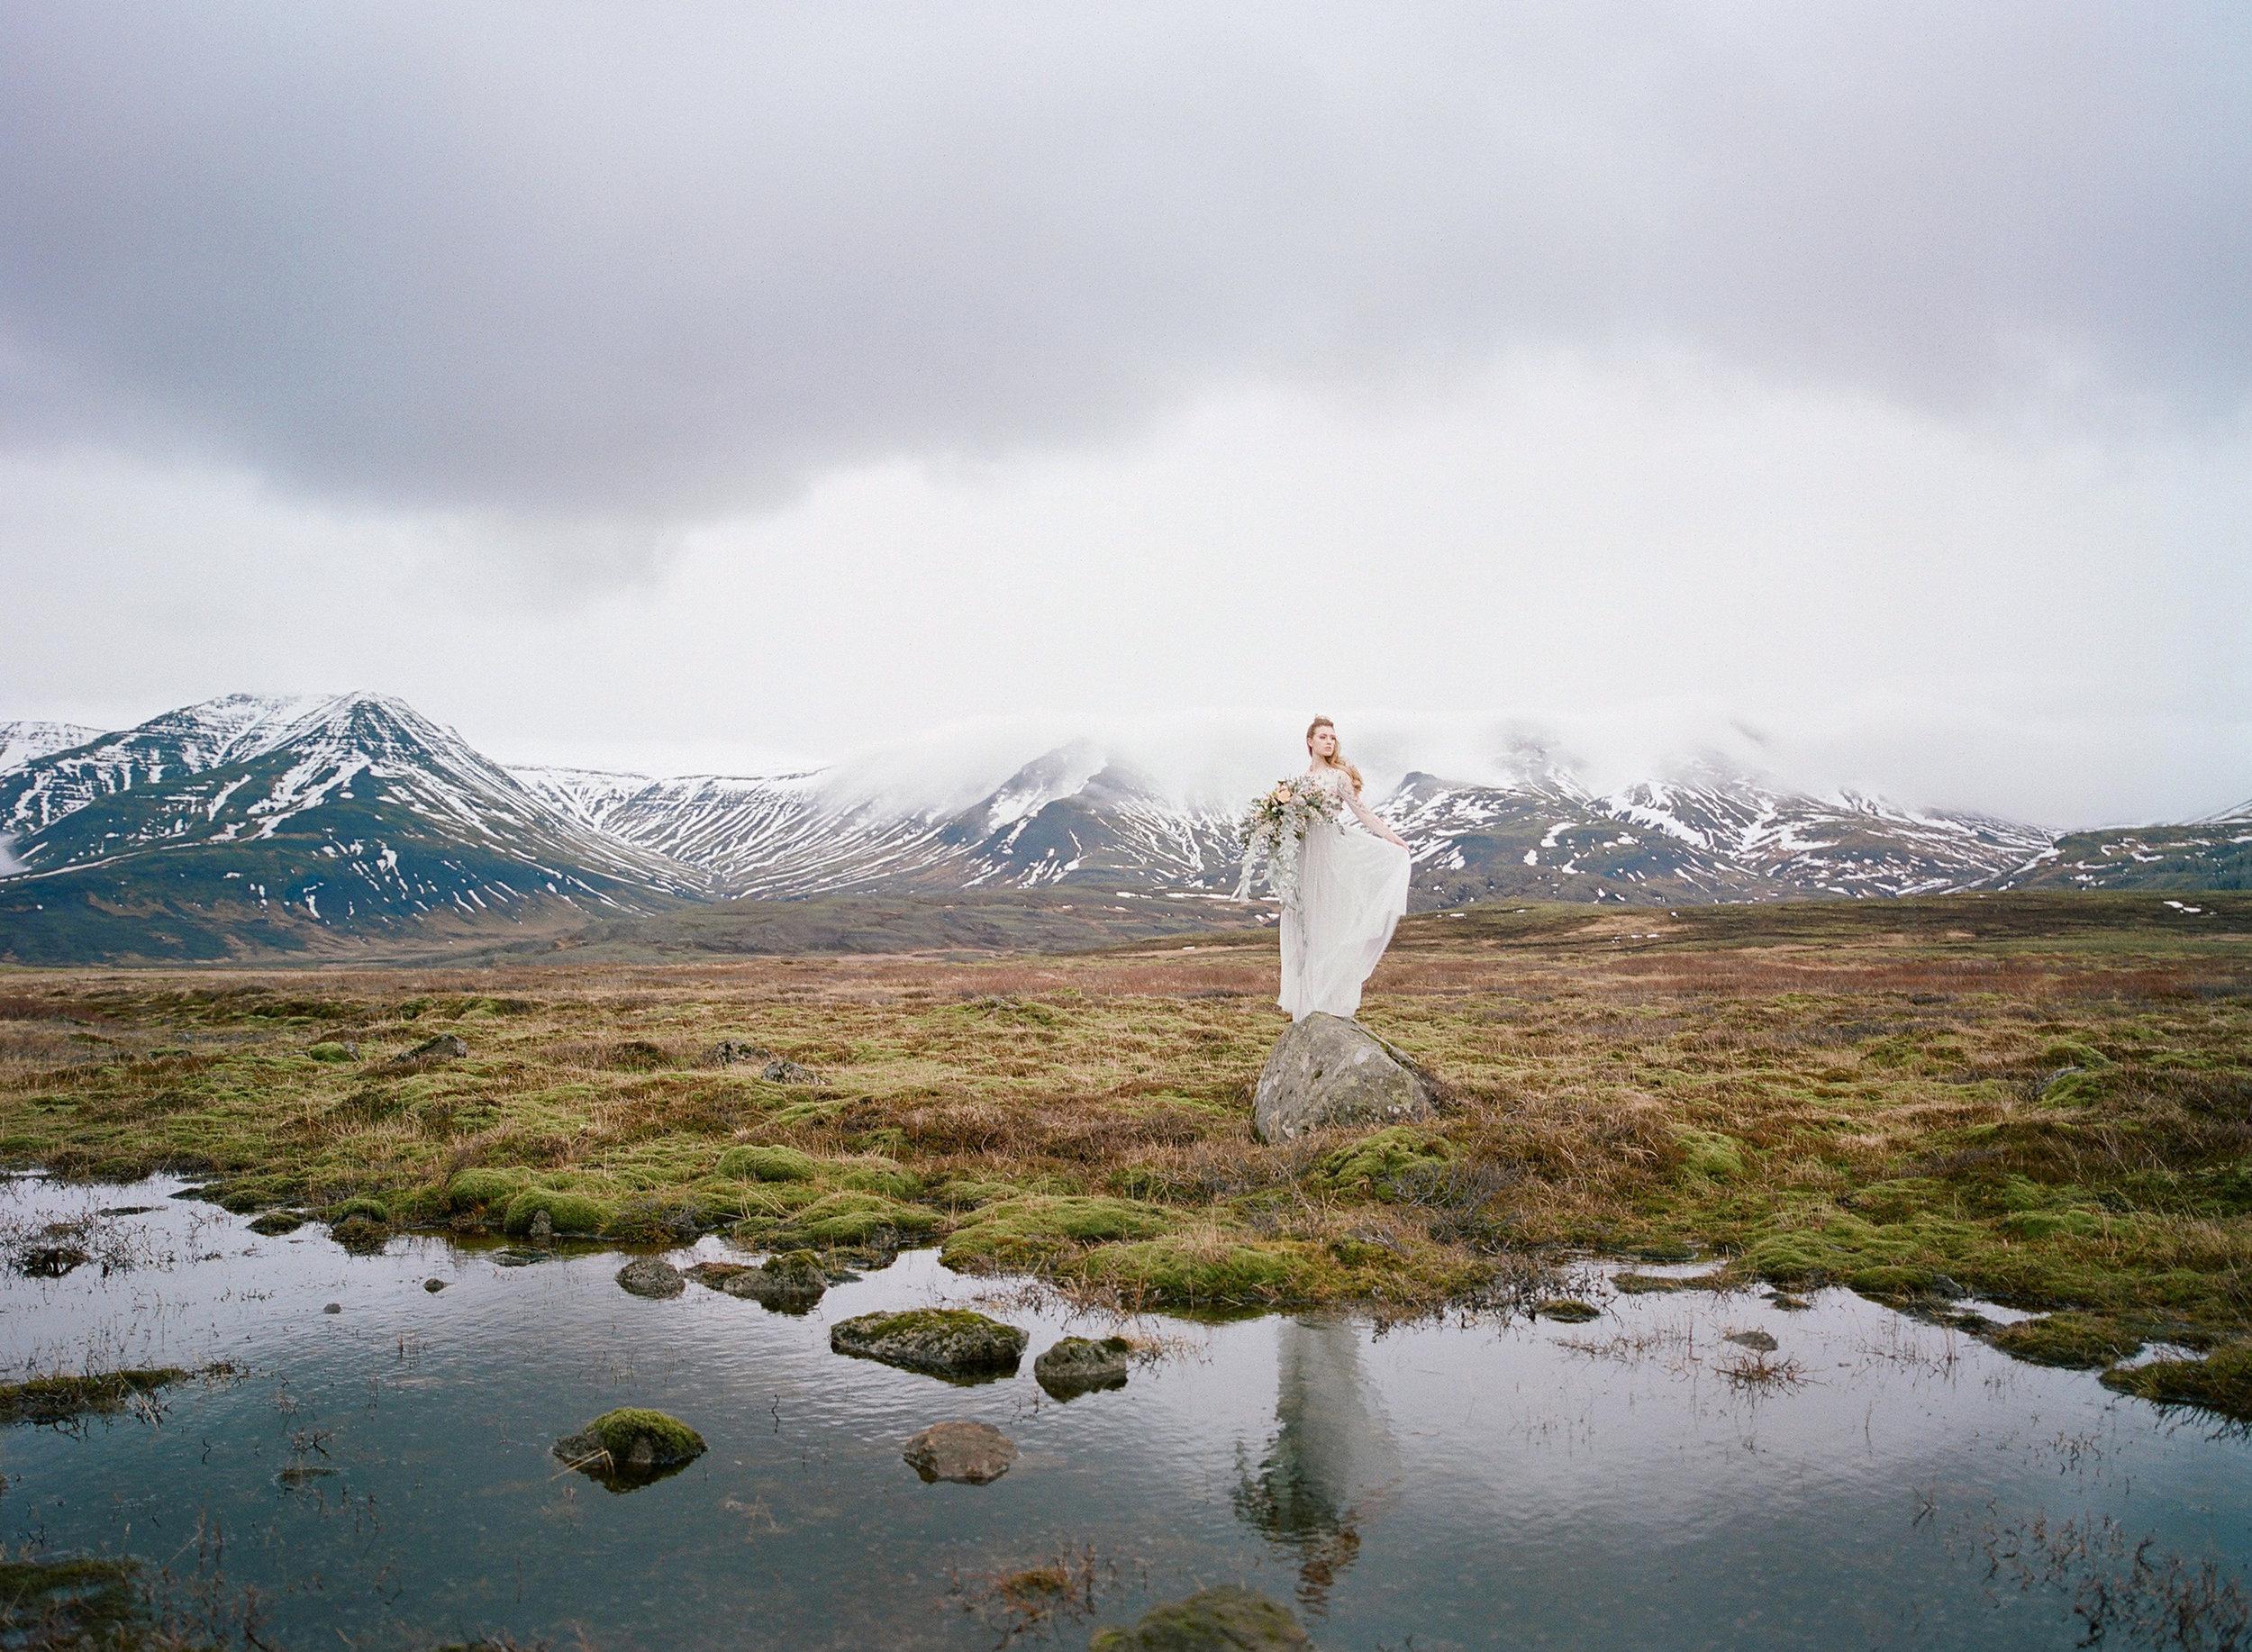 001_Iceland.jpg